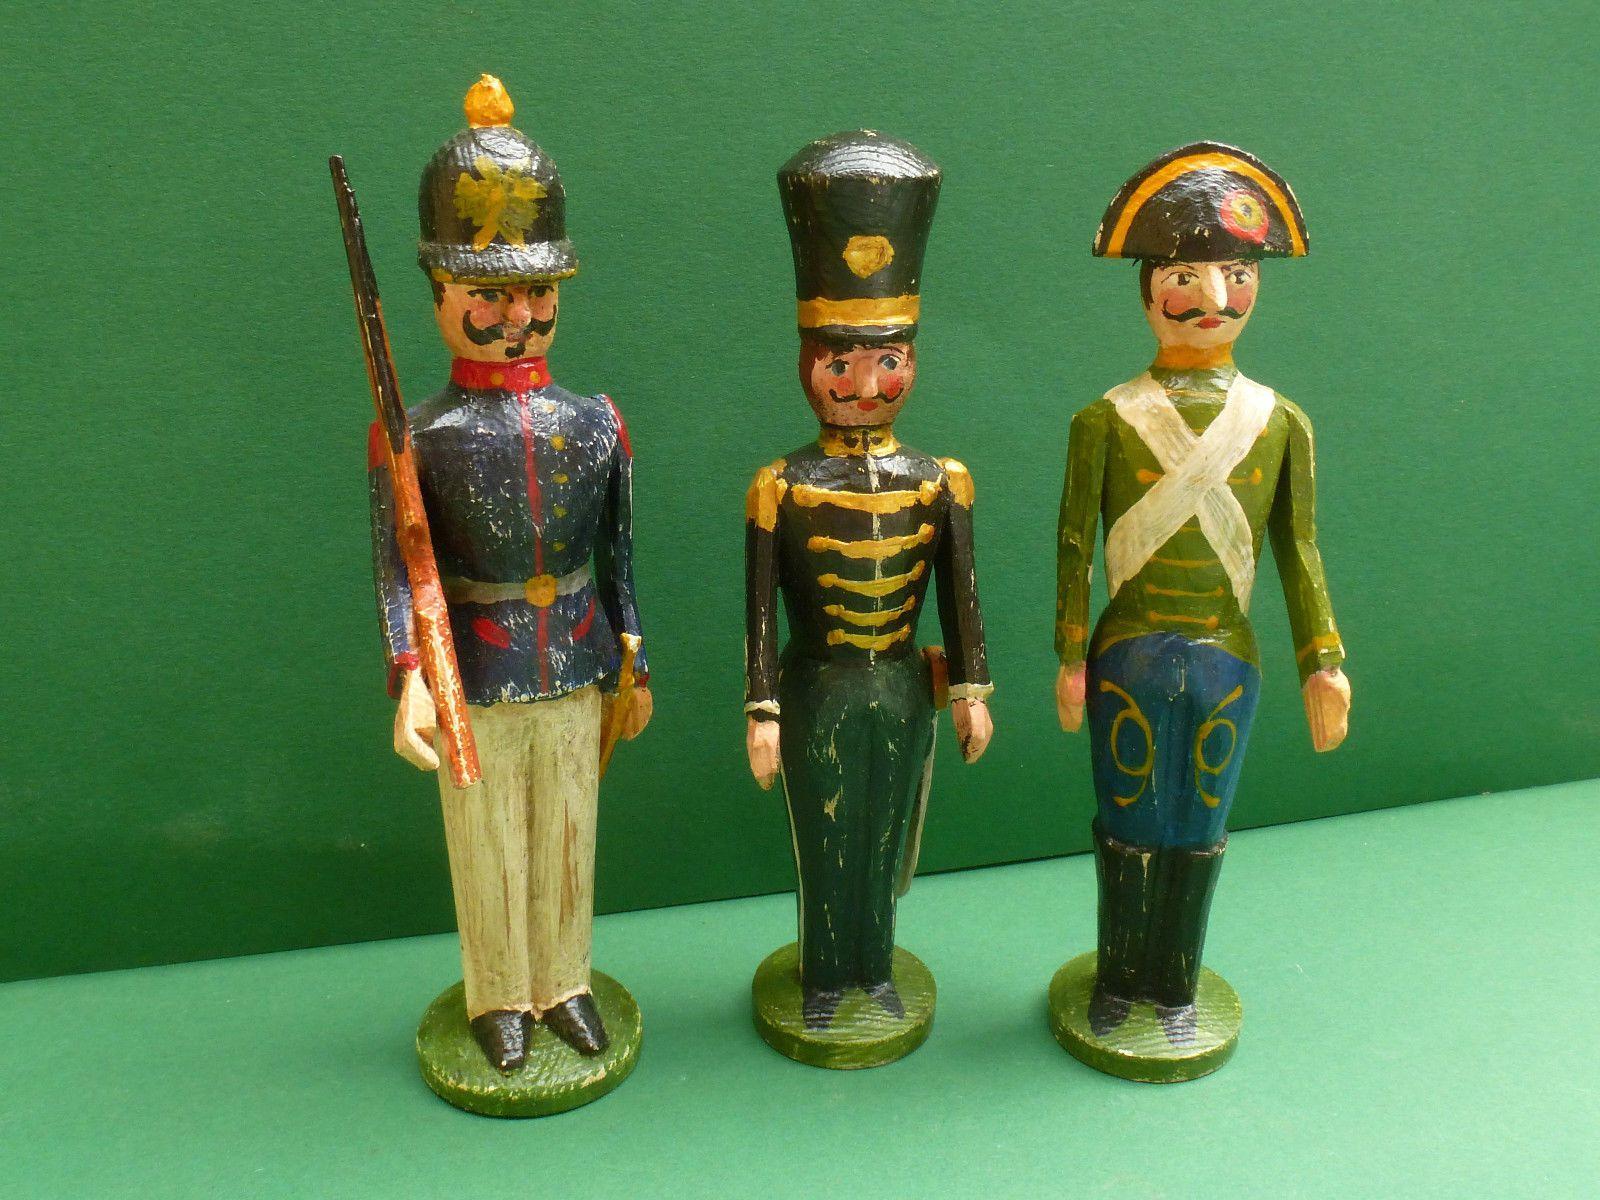 pincrutch on erzgebirge wooden toy soldiers & sailors